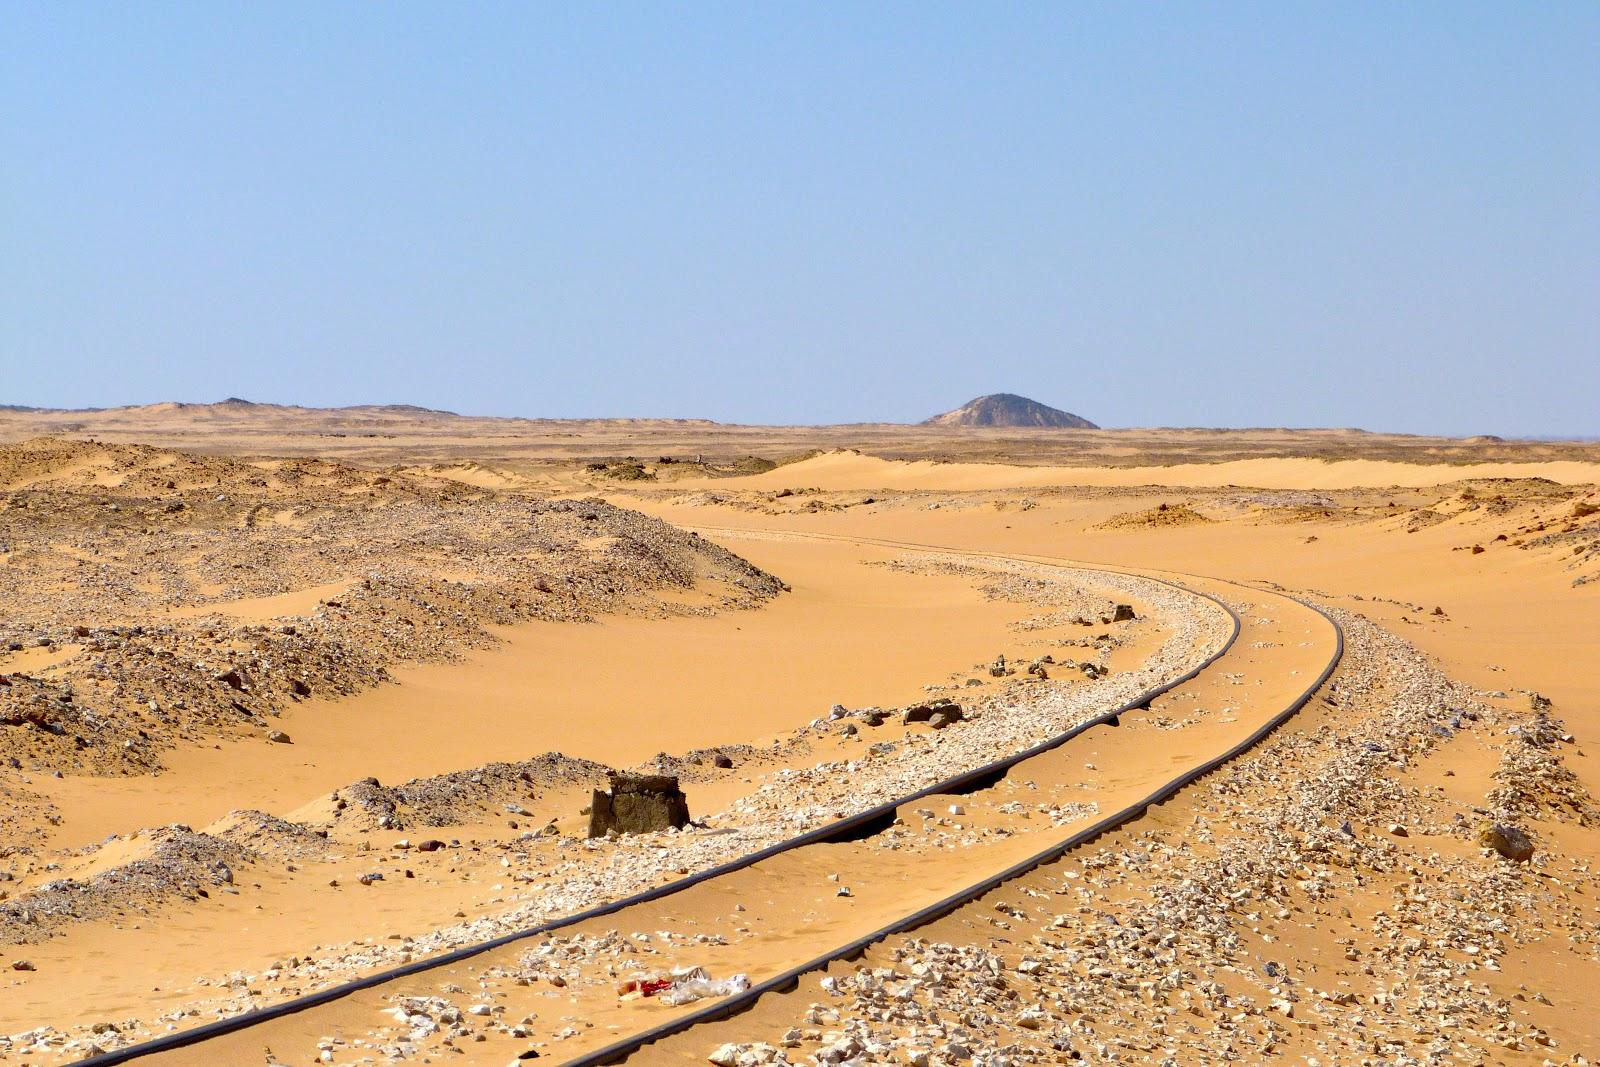 Real Desert Oasis - Bing images